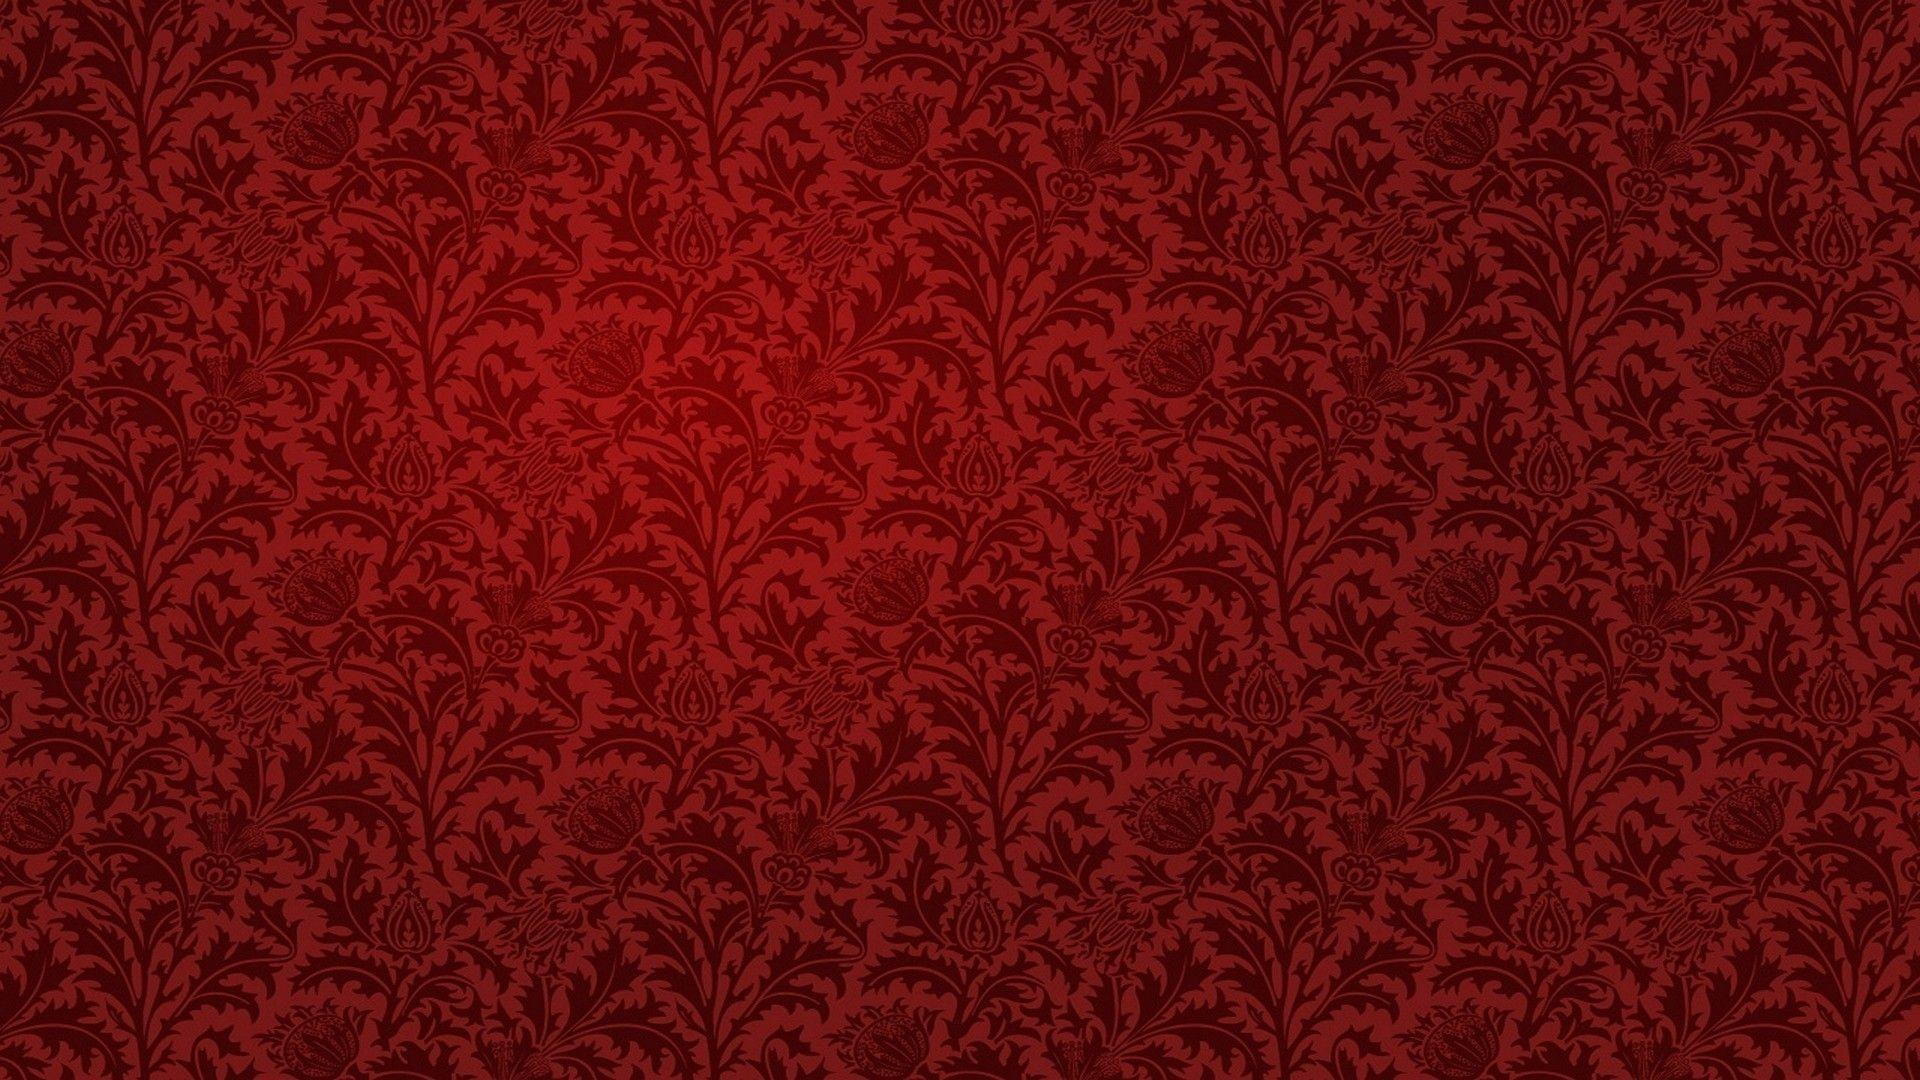 Vintage Wallpaper 5 1920x1080